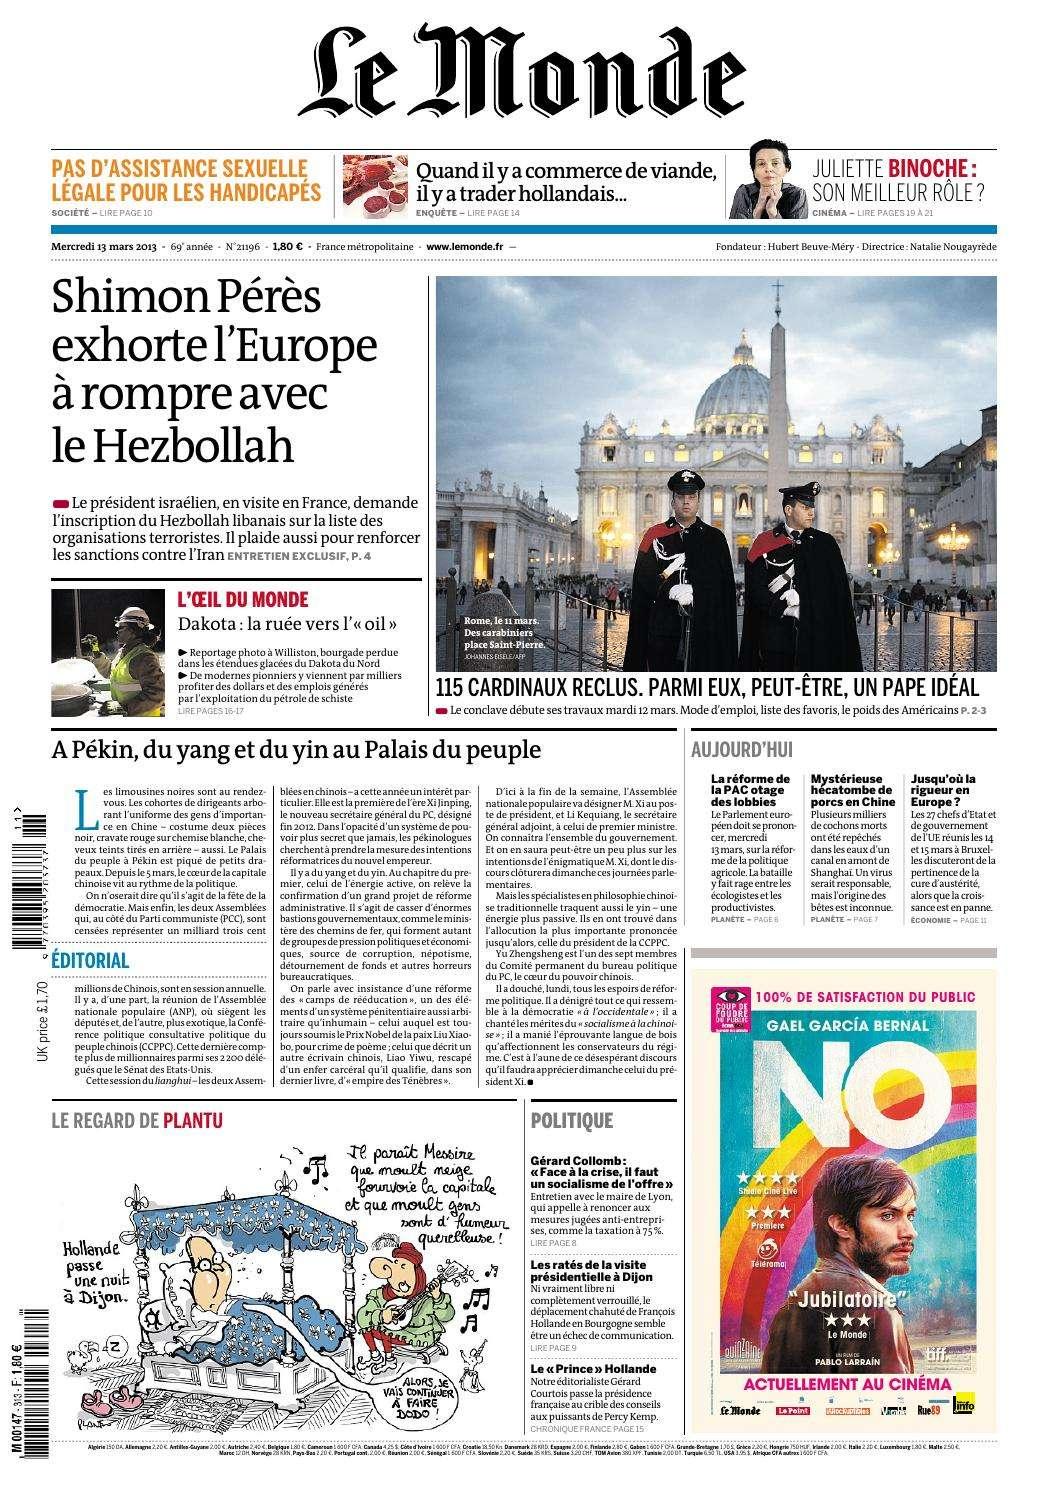 Le Monde Mercredi 13 Mars 2013